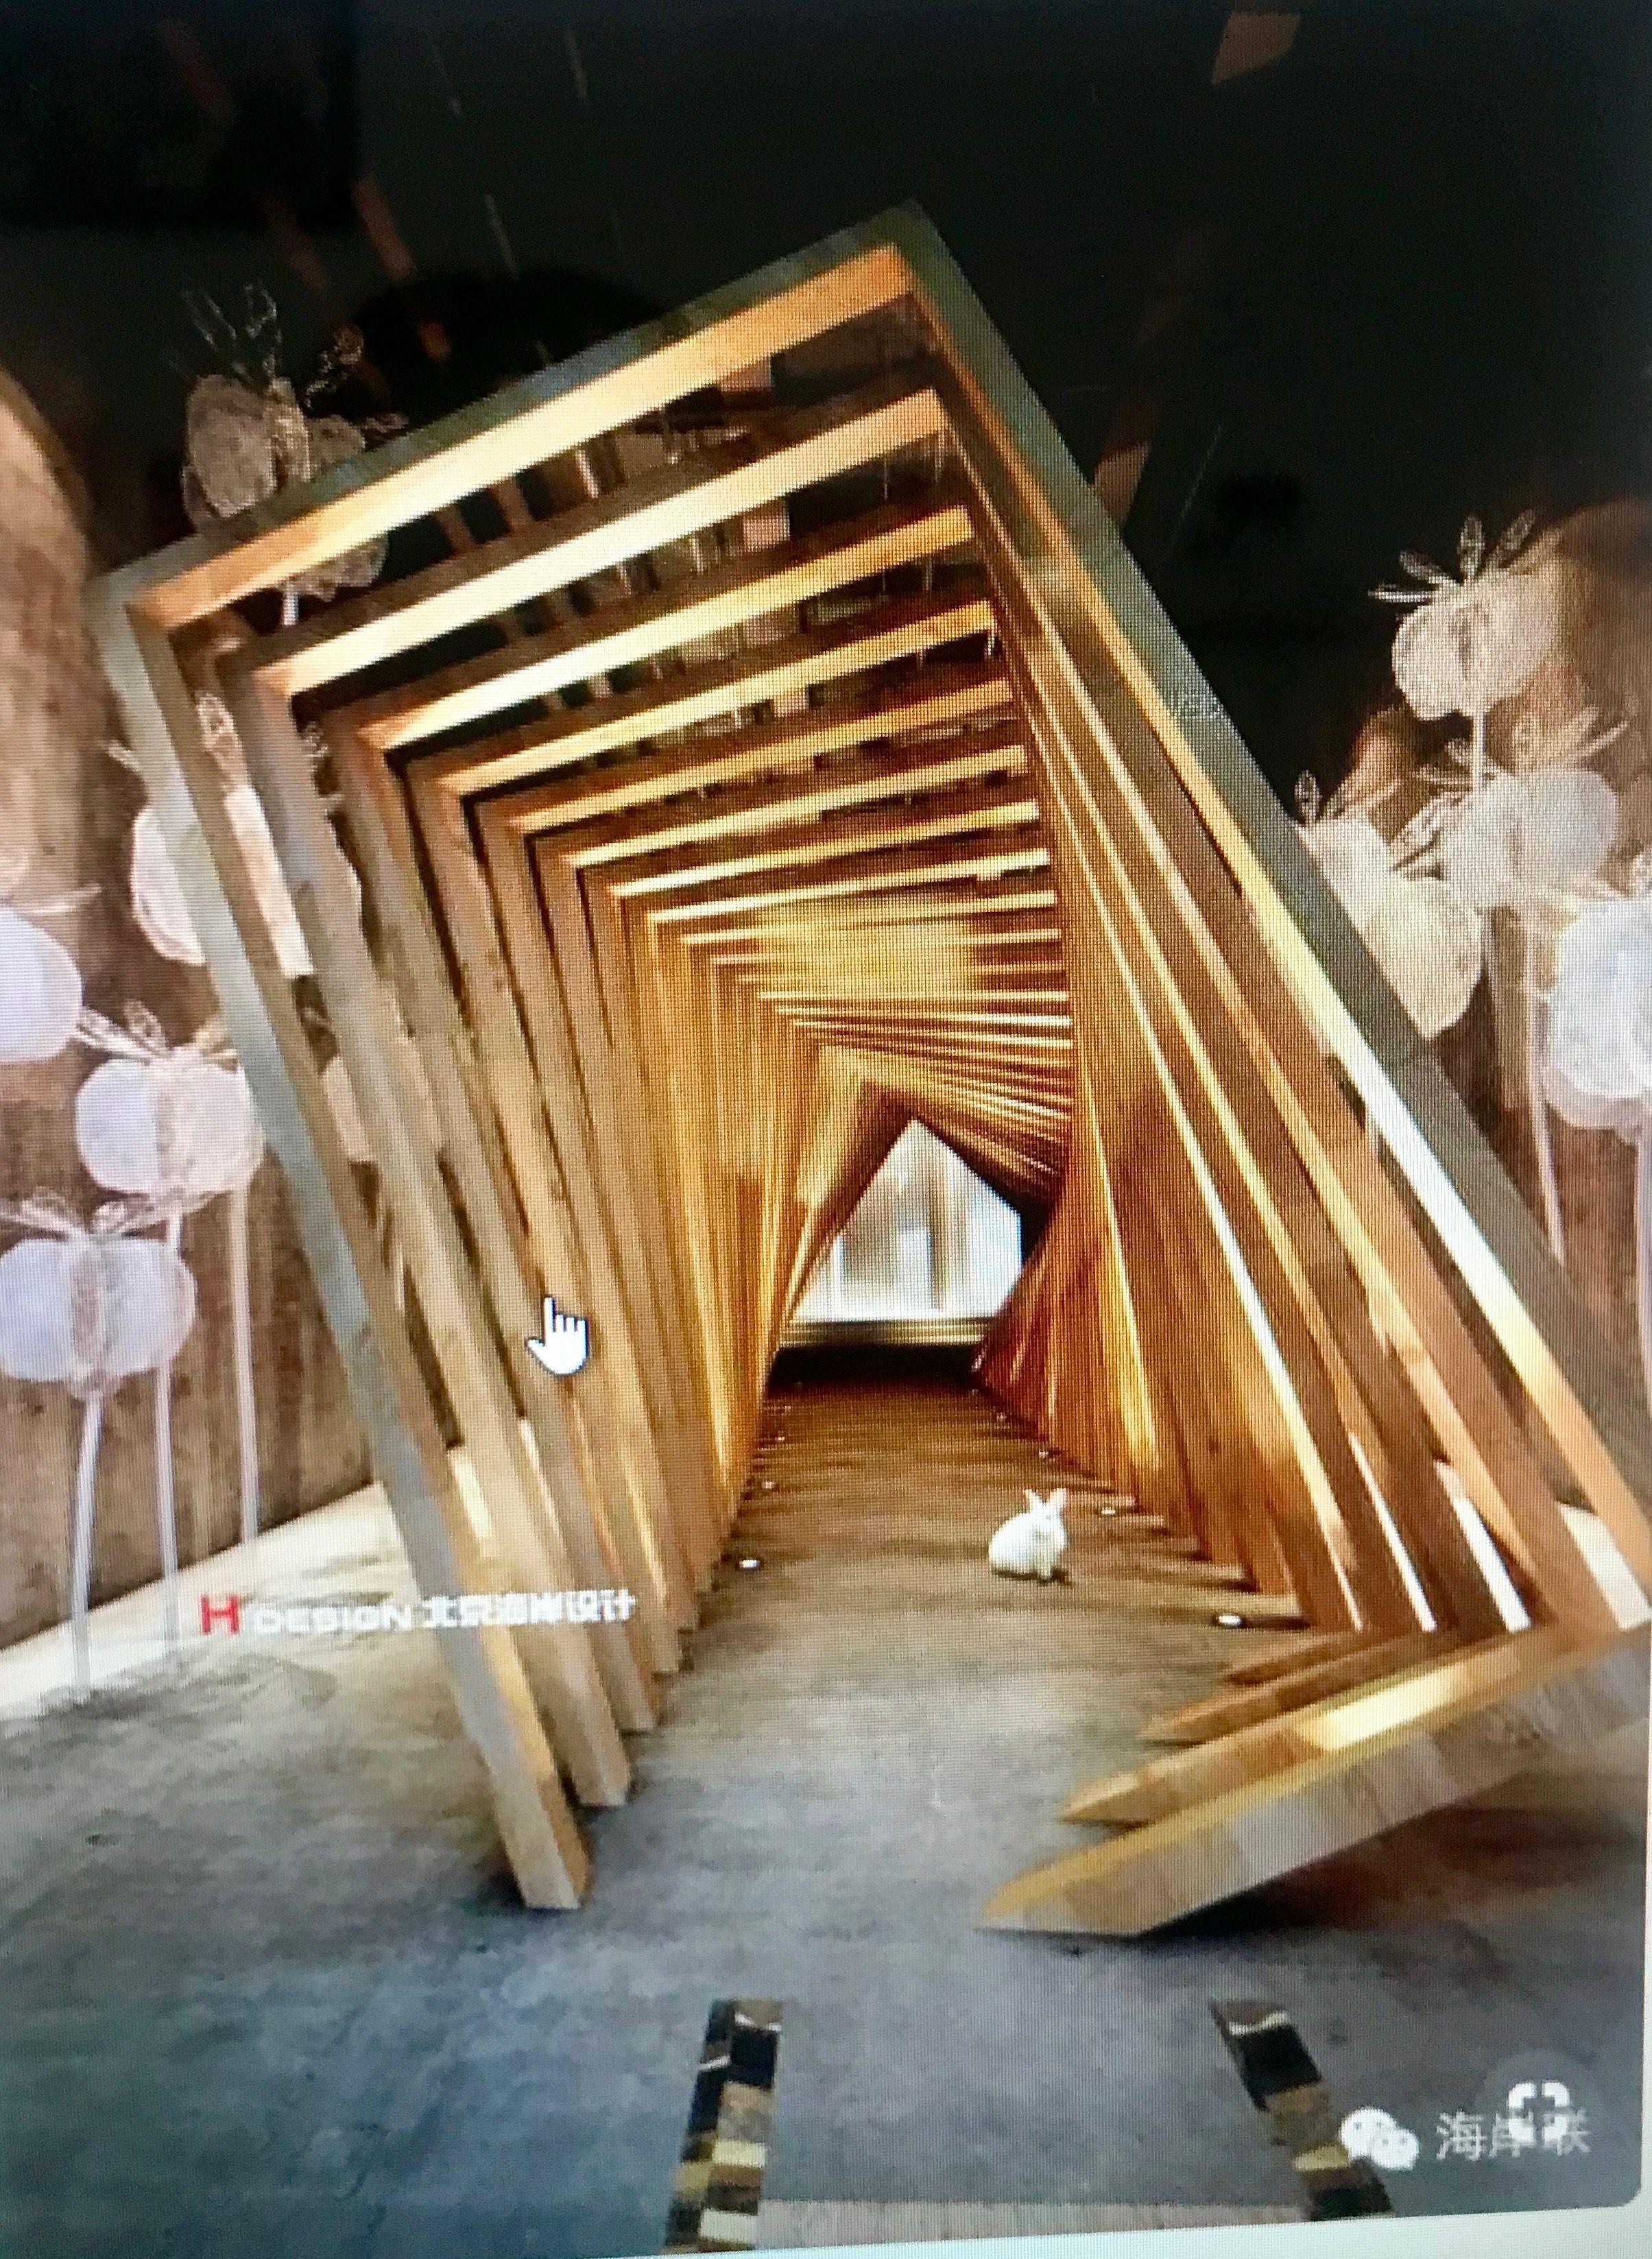 pavillion garten #garten #garten Ritmo #architektonischepräsentation